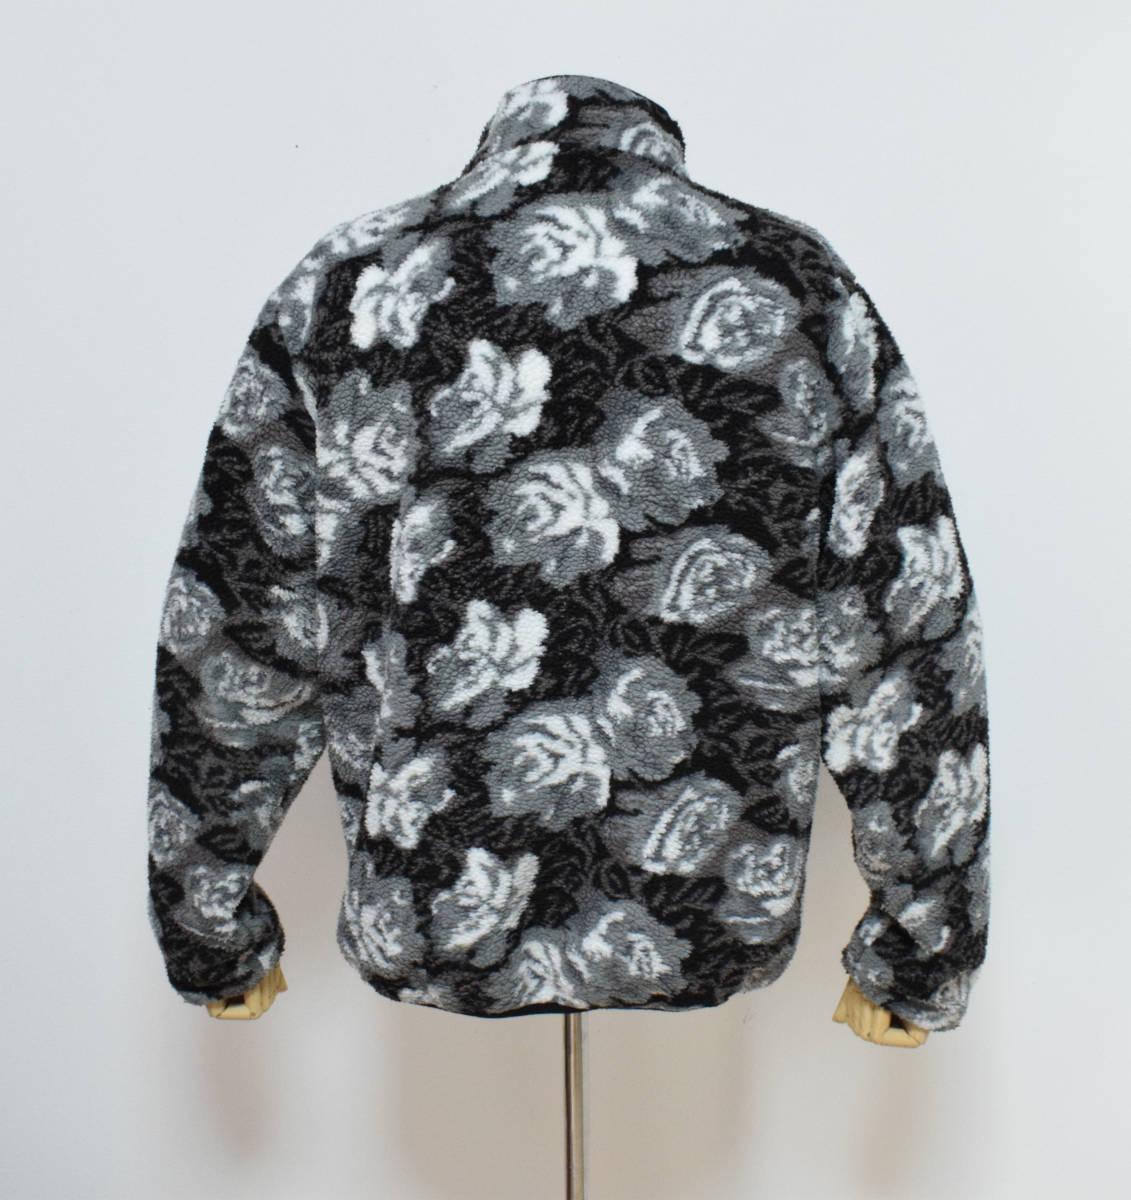 16aw supreme シュプリーム Roses Sherpa Fleece Reversible Jacket ローズシェルパ フリース リバーシブル ジャケット M //_画像2